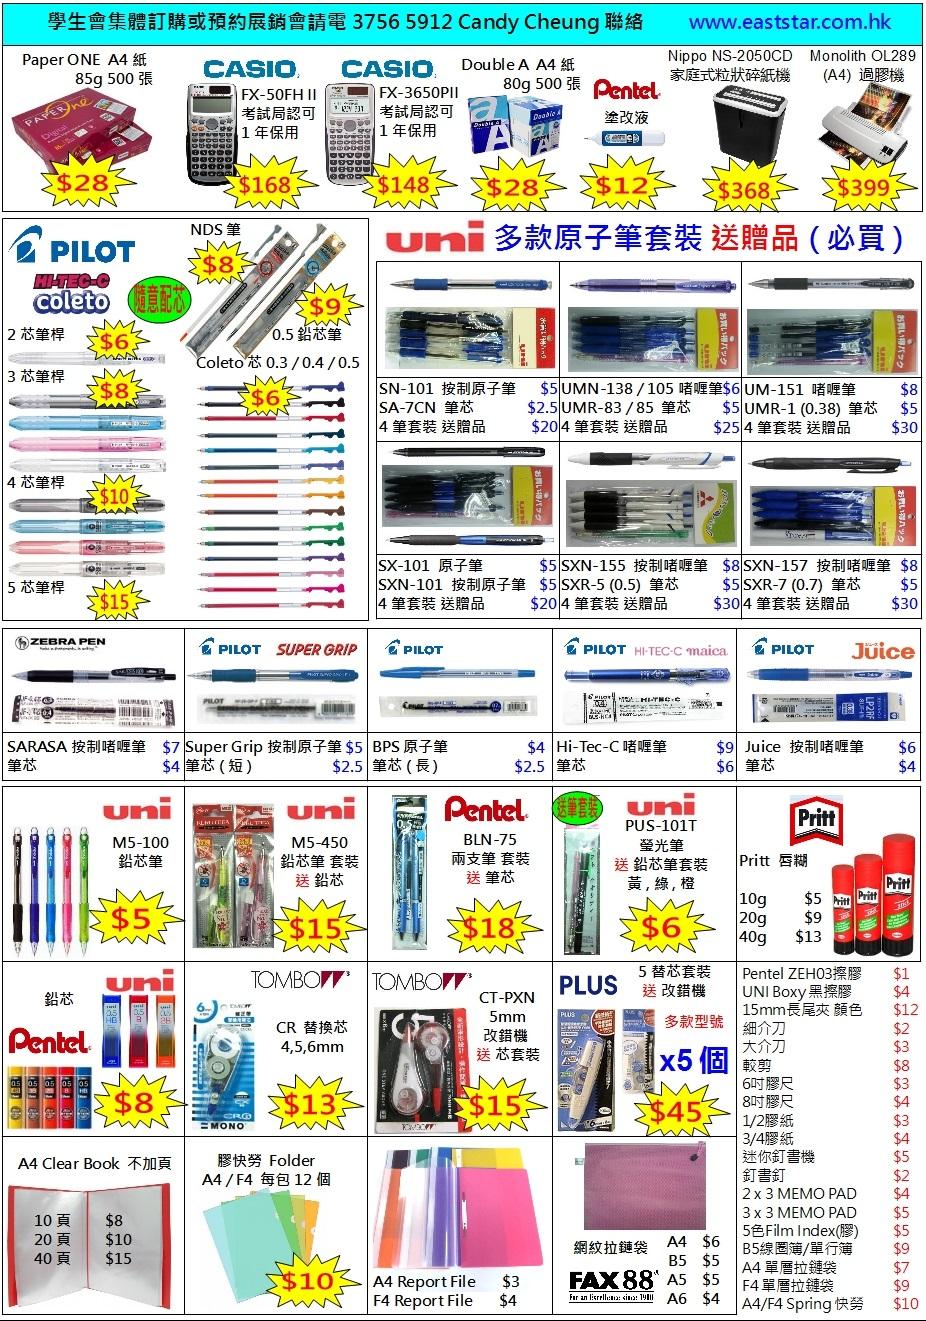 http://a100.com.hk/data/upload/shop/article/05264200275039429.jpg